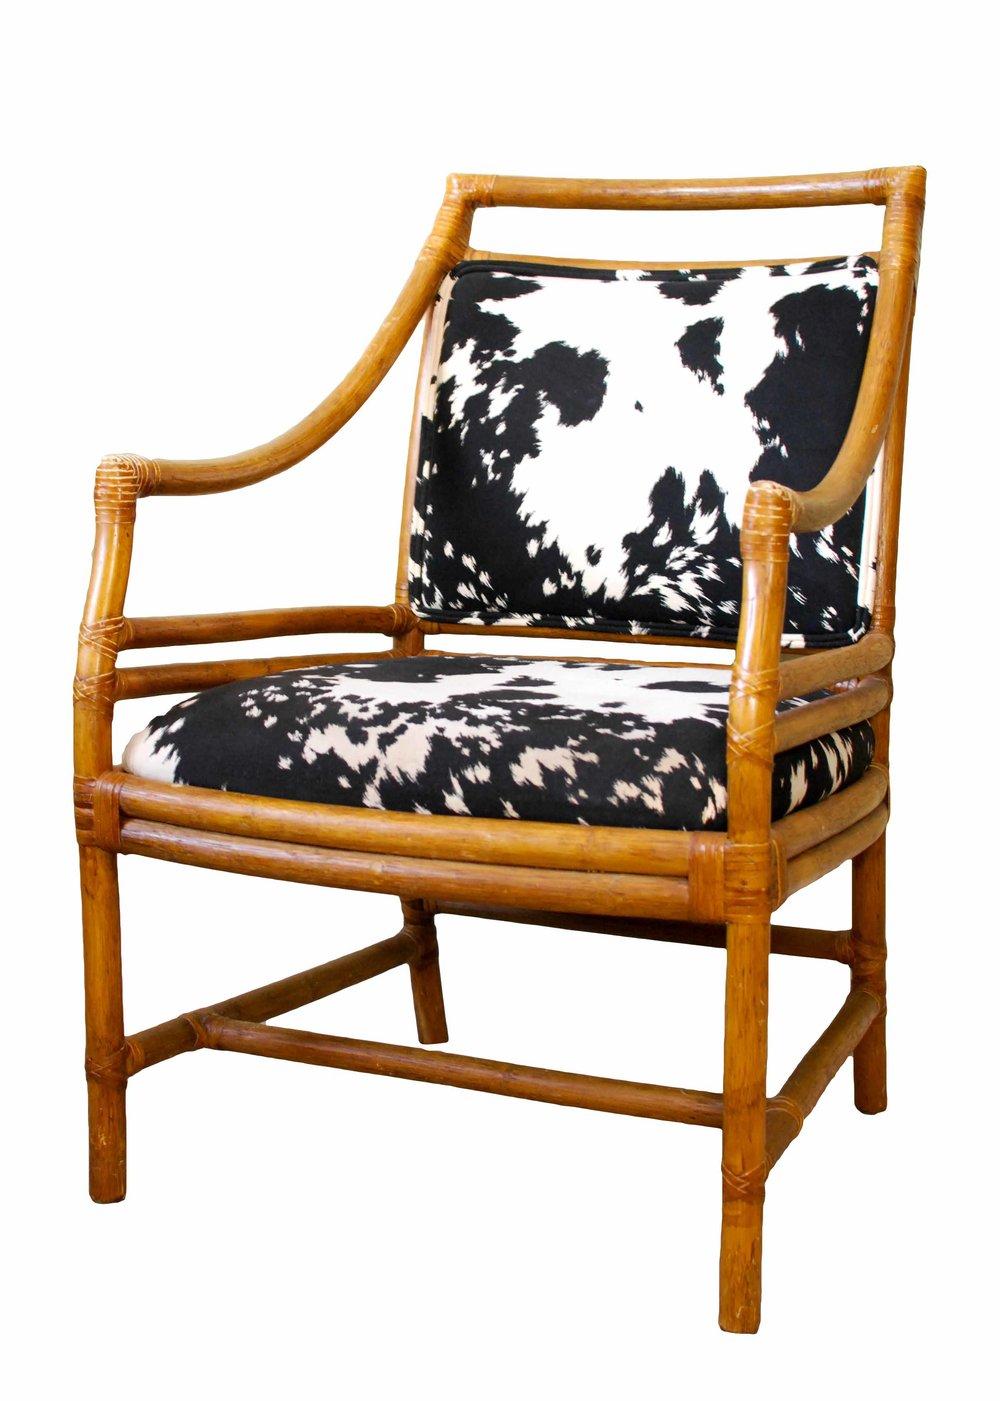 COWHIDE bamboo chair